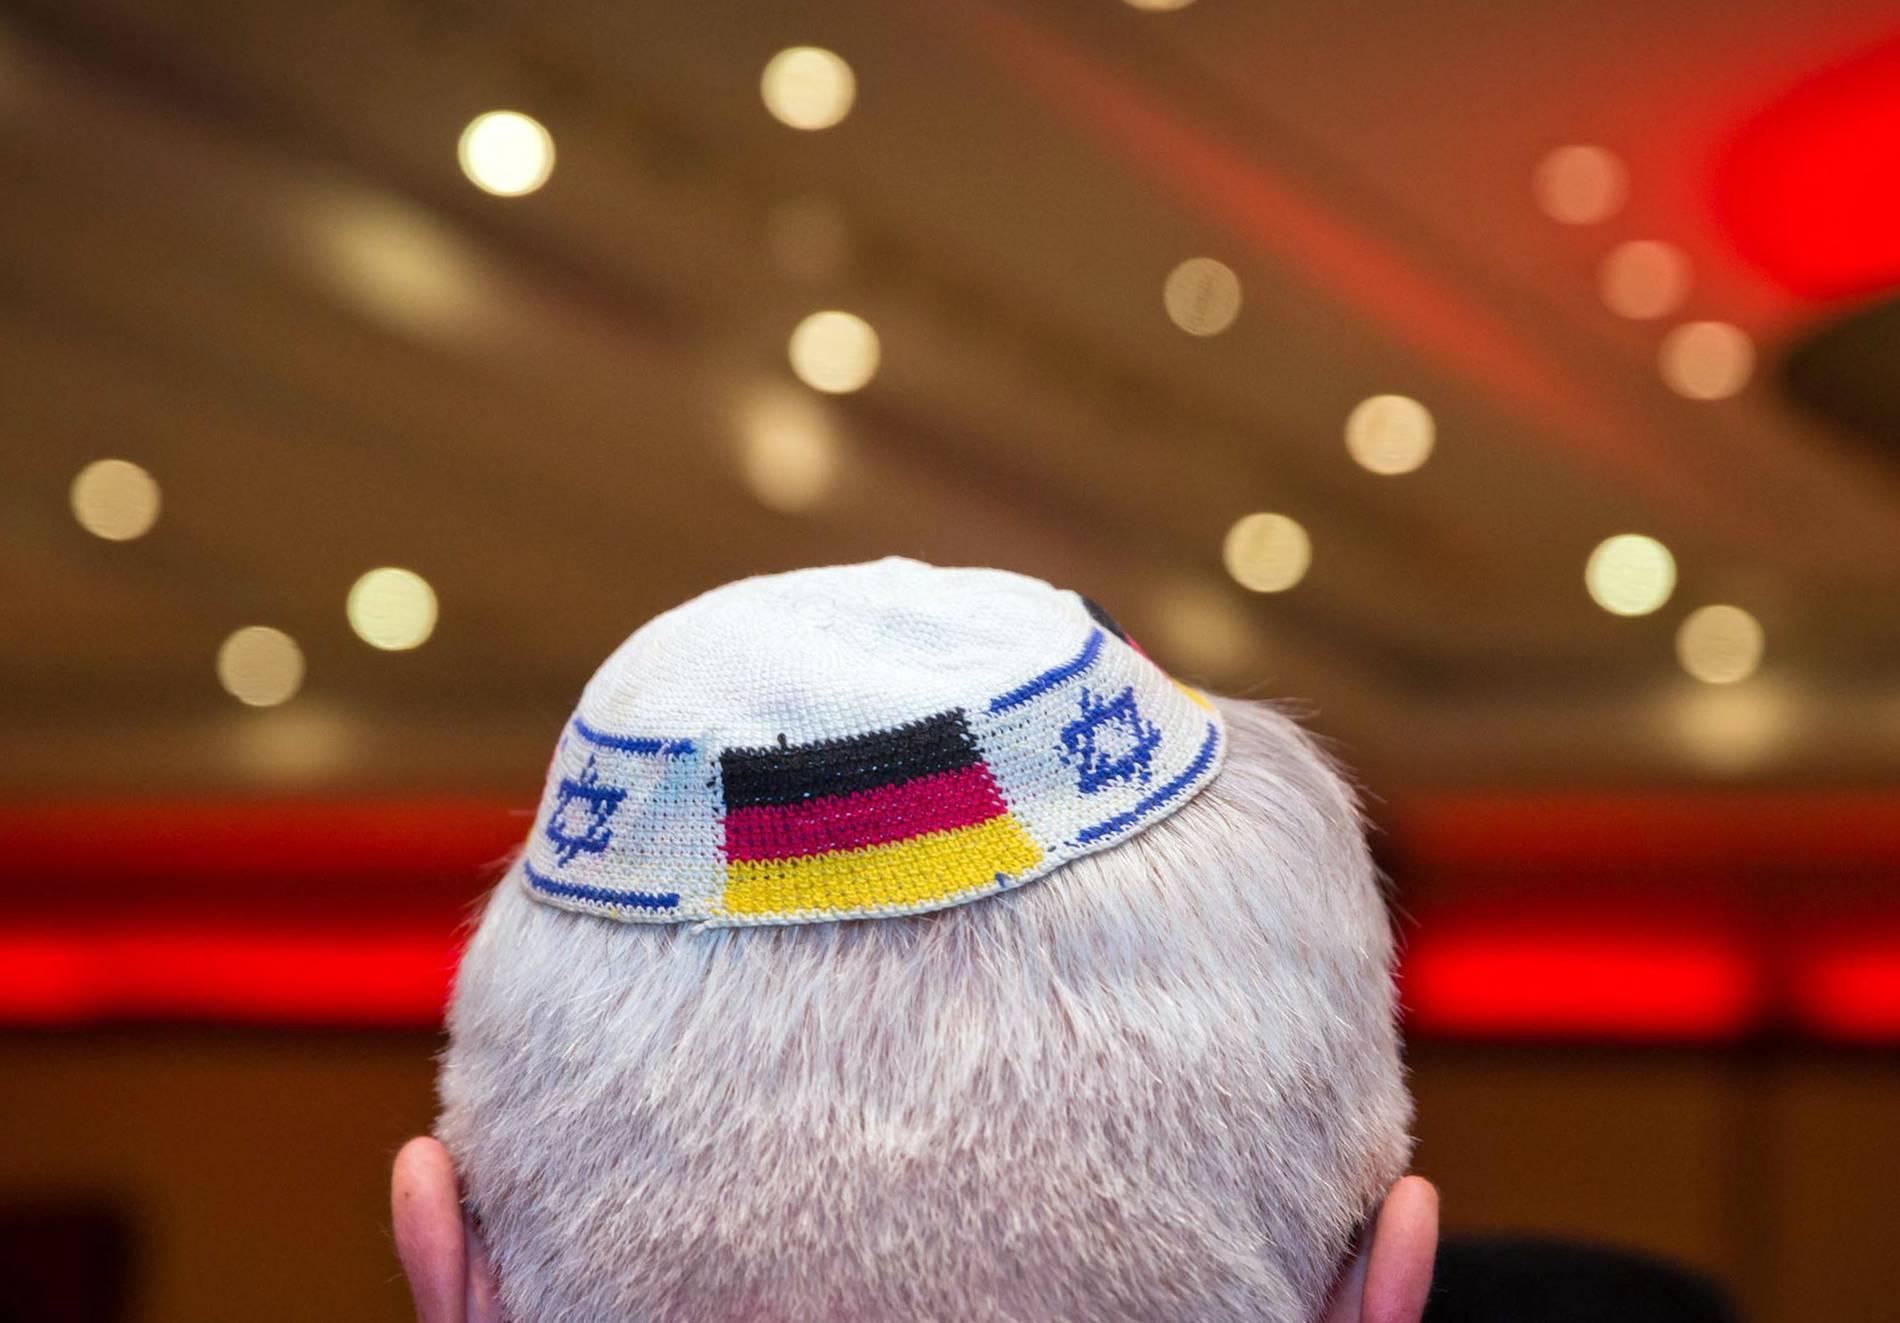 Jüdischer Dating-Standort Israel Altersverhältnis datiert